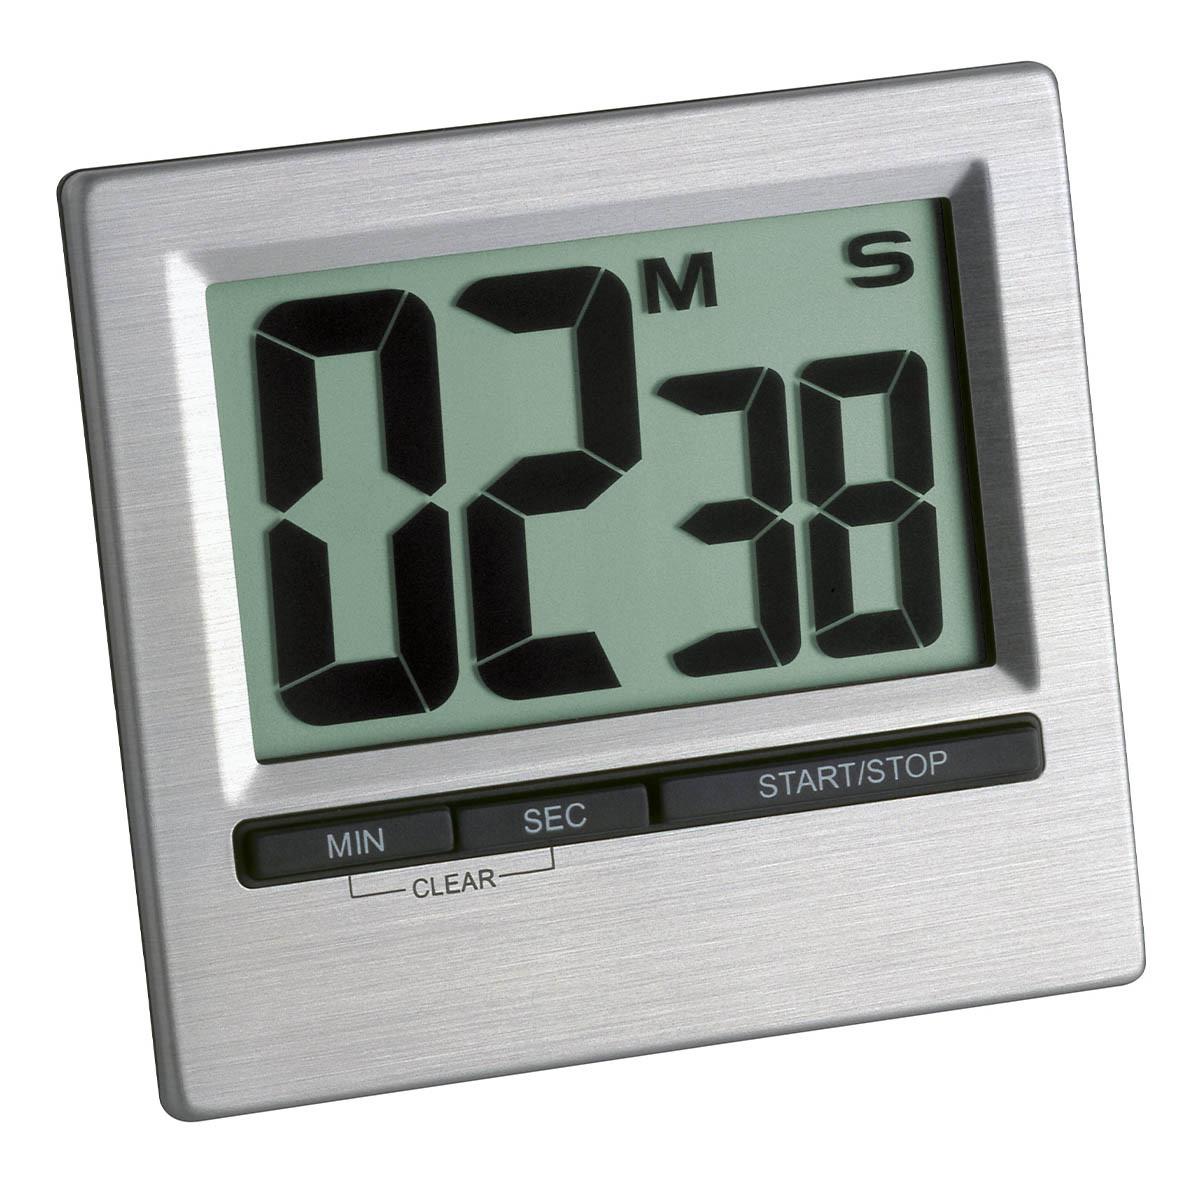 38-2013-54-digitaler-timer-stoppuhr-mit-aluminium-front-1200x1200px.jpg